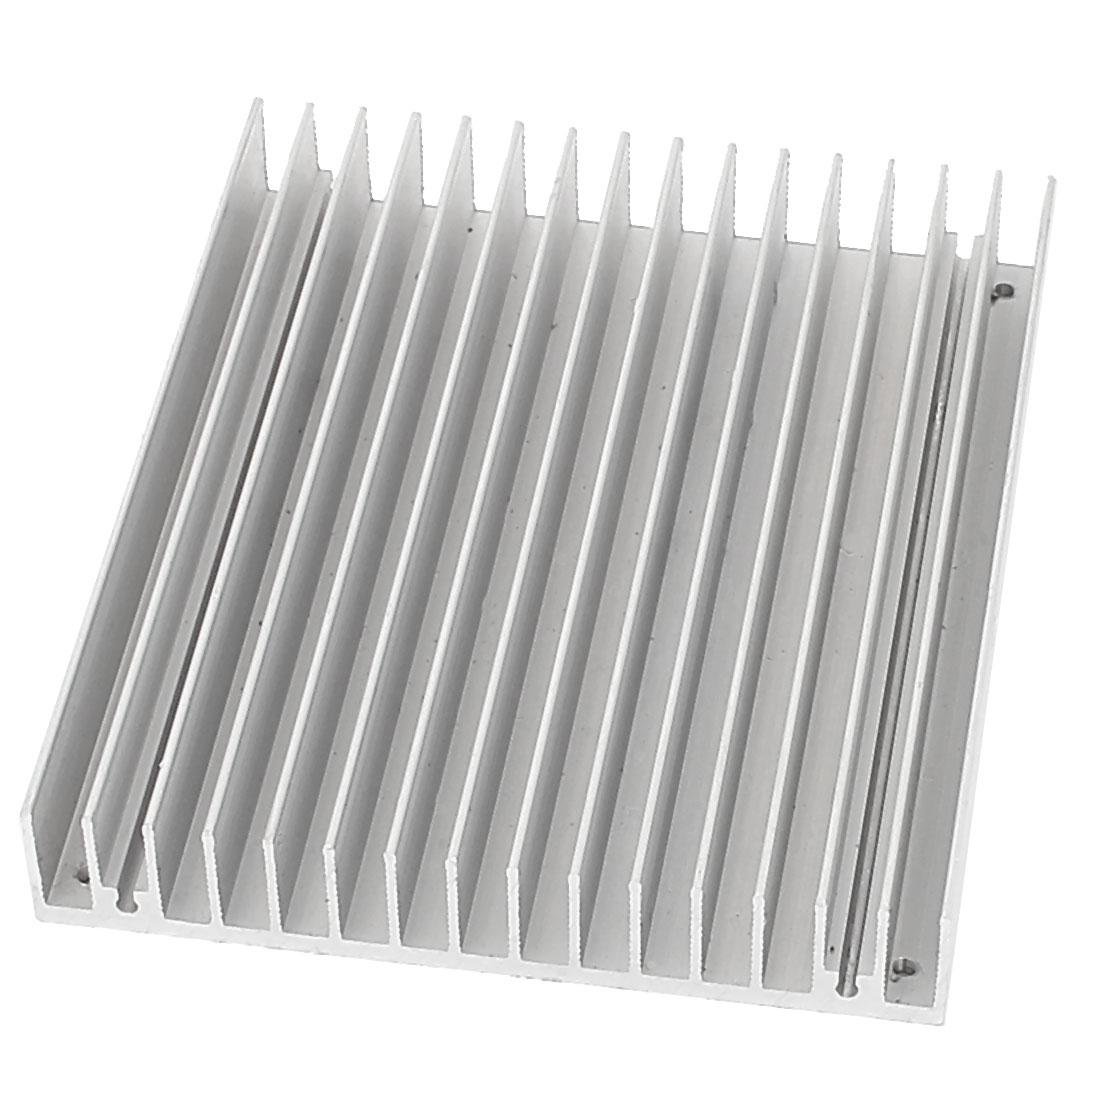 120 x 100 x 18mm Aluminium Heat Diffusion Heatsink Cooling Fin